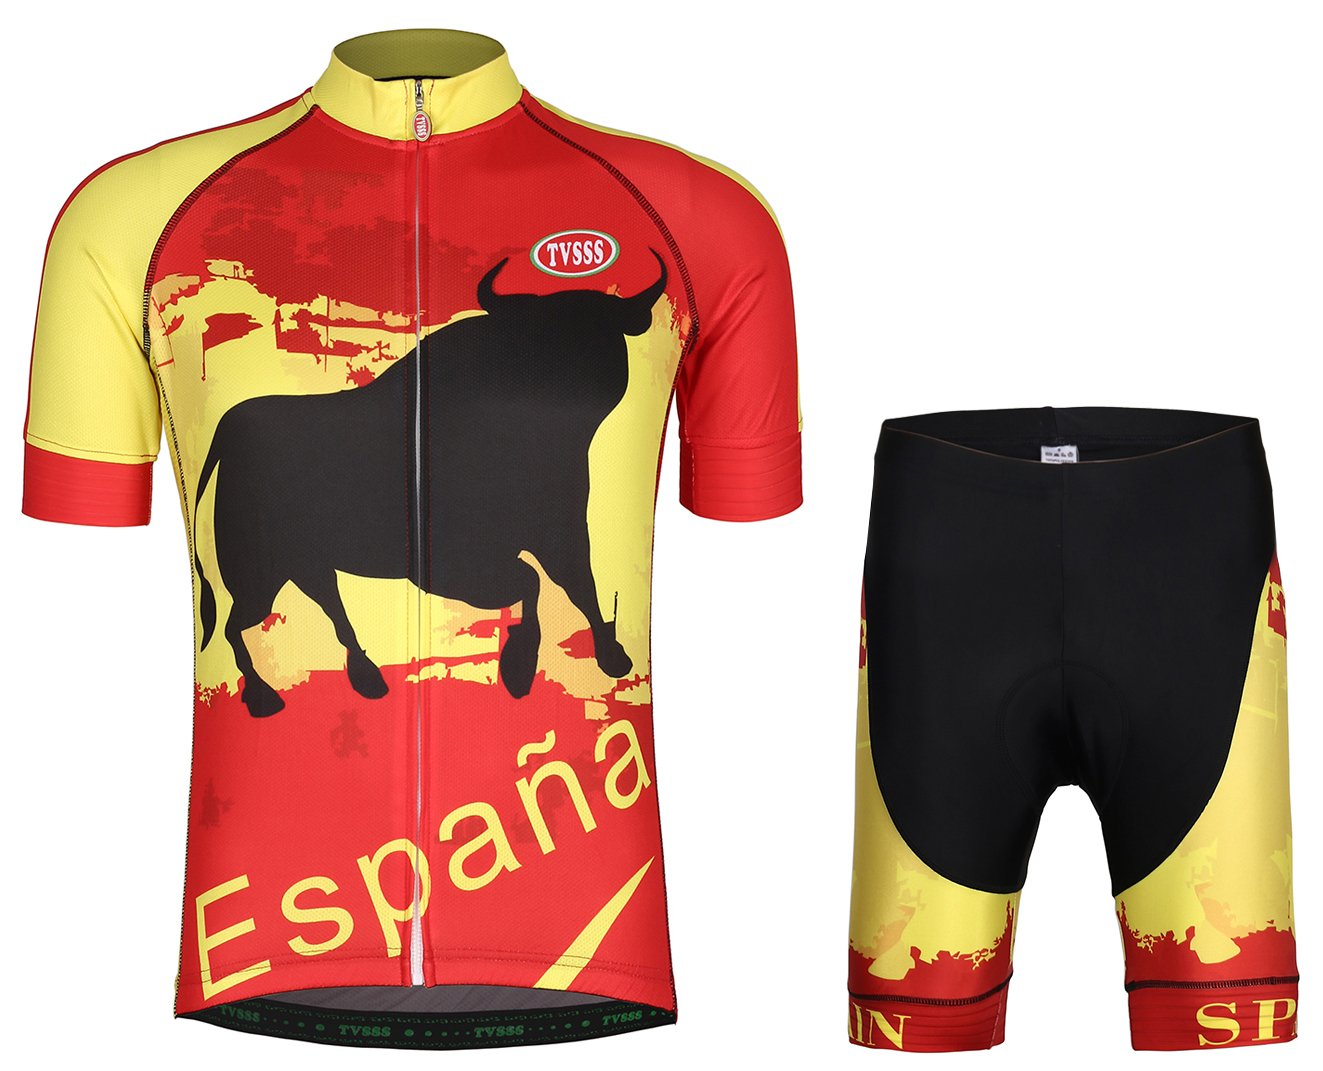 Cycling Jersey Sets Men's Bib Shorts Short-Sleeved Summer Cycling Clothing Team Suits B074284MCC Small|Spanish Set 3 Spanish Set 3 Small